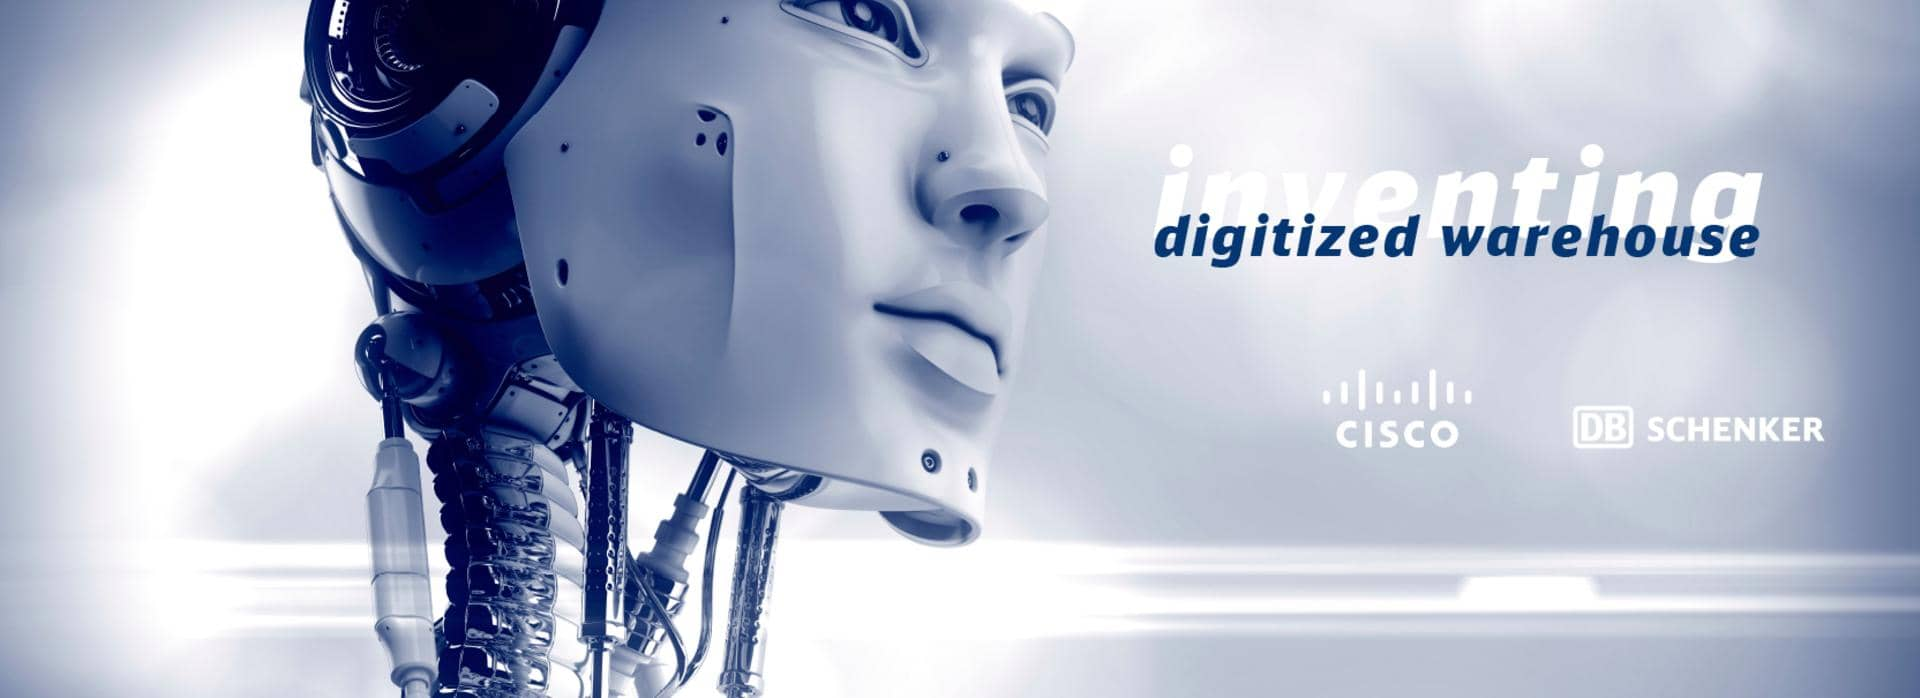 Cisco Human robot digitized warehouse